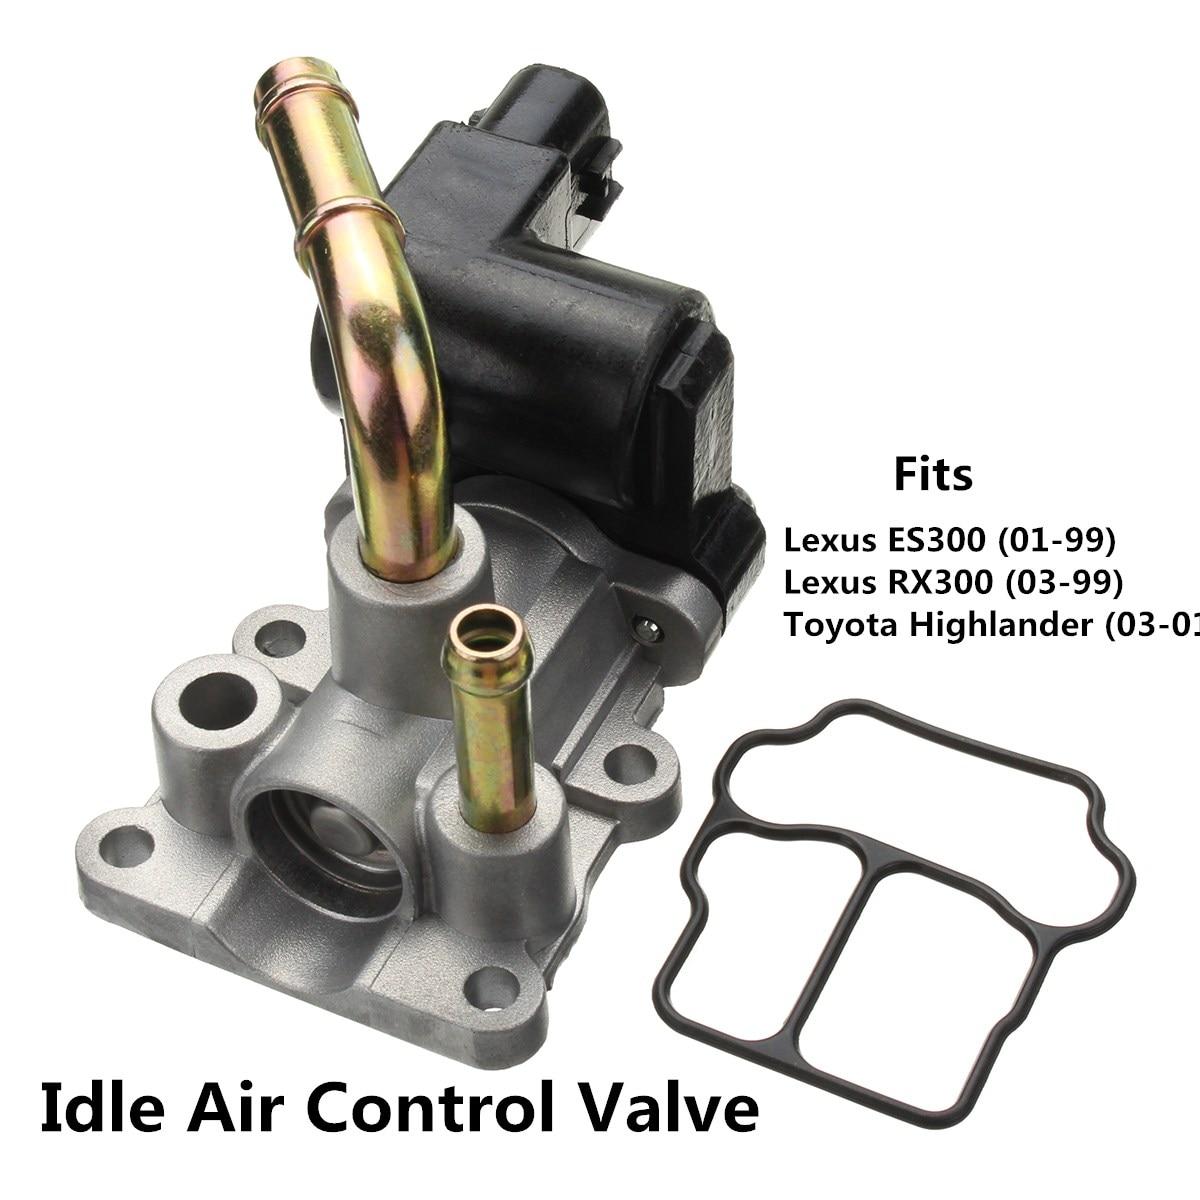 New Idle Air Control Valve fits Lexus 99-01 ES300 99-03 RX300 01-03 Highlander